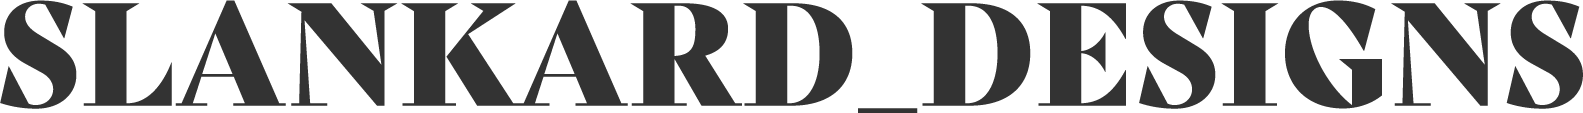 SLANKARD_DESIGNS Logo